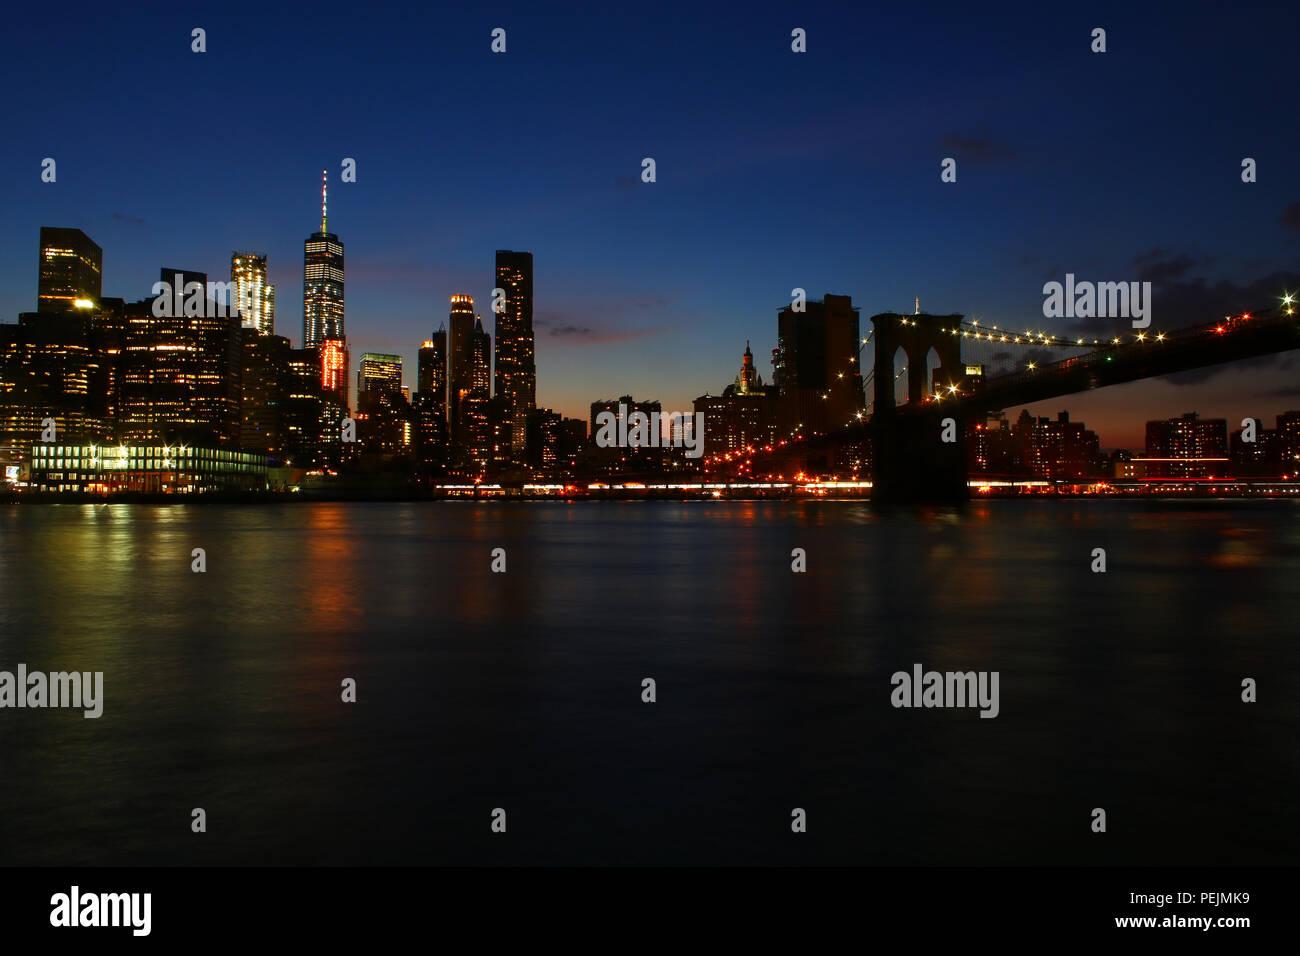 NEW YORK, NY - JULY 03: Financial District, Lower Manhattan, and Brooklyn Bridge skyline after sunset as seen from Brooklyn Bridge Park, Brooklyn on J Stock Photo